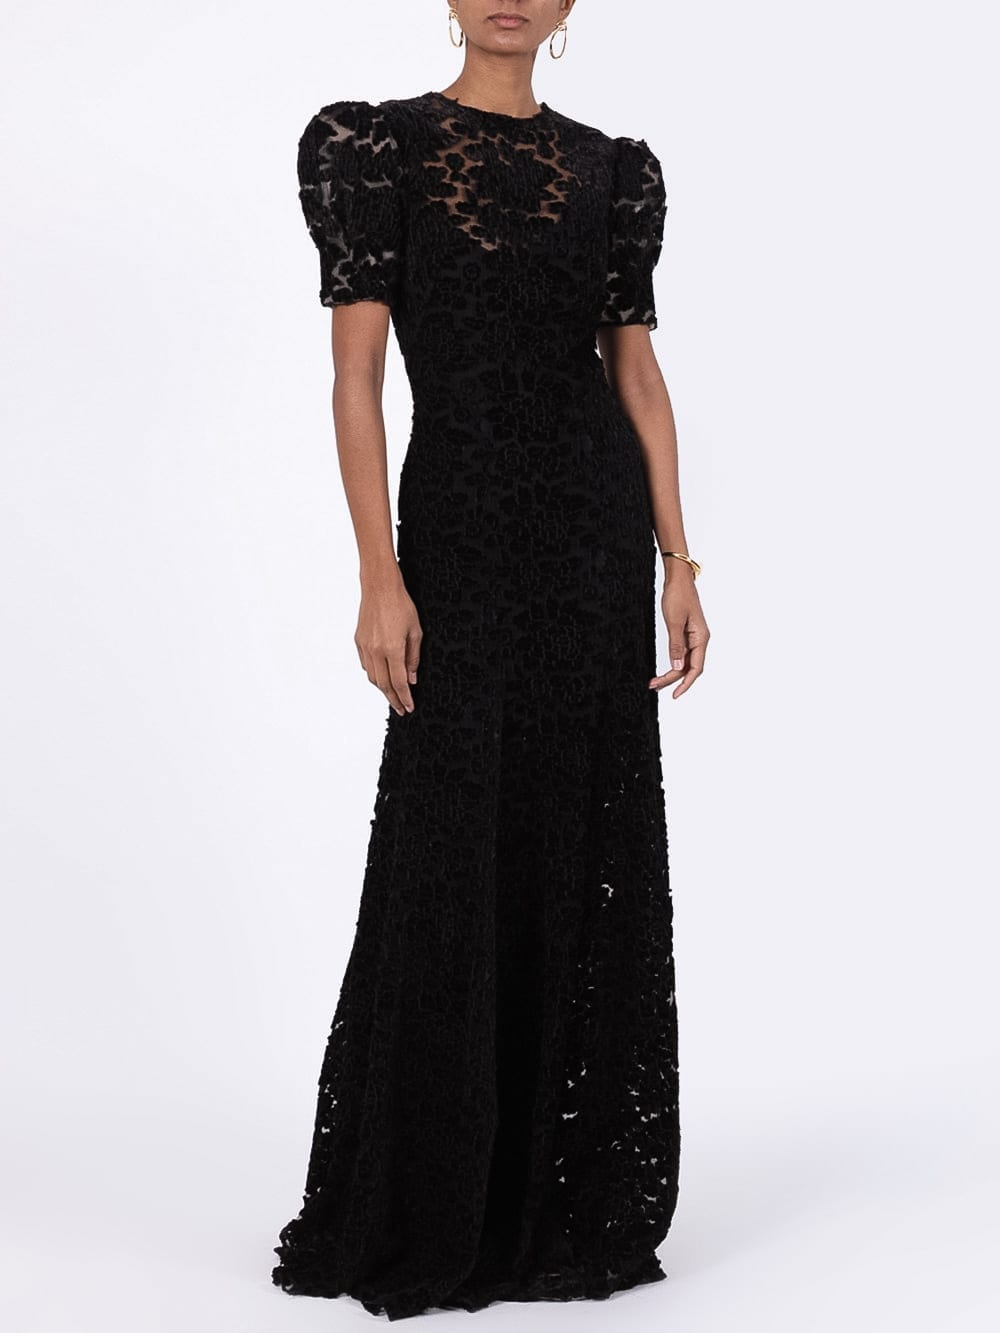 THE VAMPIRE'S WIFE Chevron Detail Dress